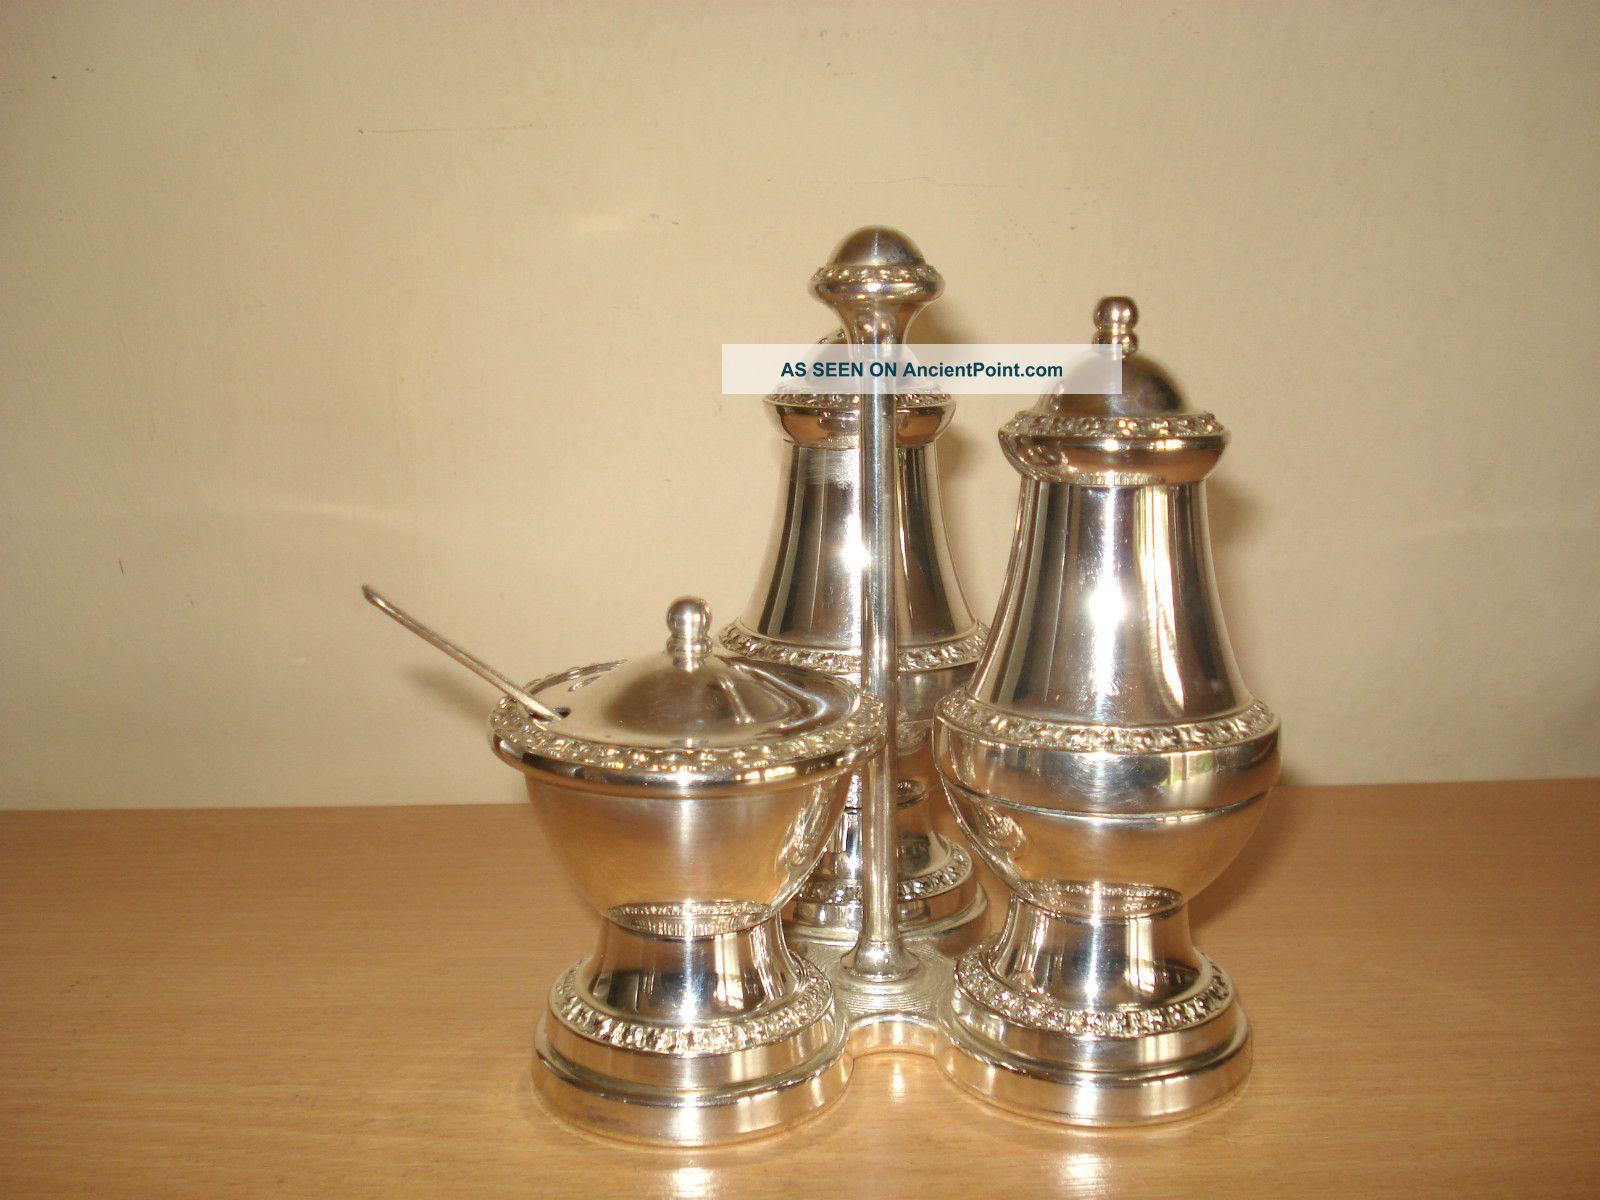 Lovely Ianthe Silver Plated Cruet Set Salt & Pepper Cellars/ Shakers photo